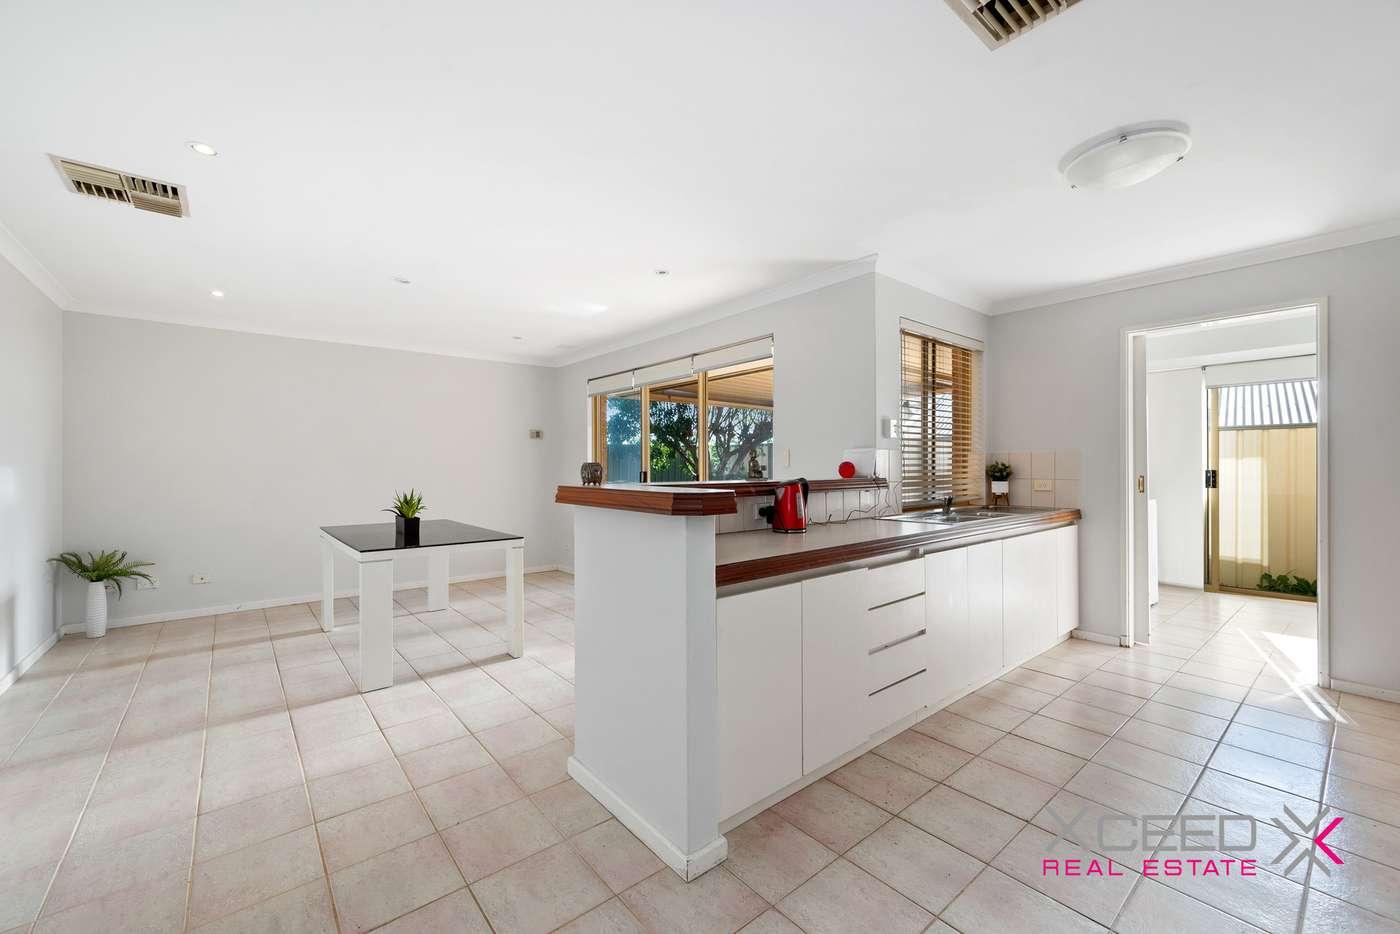 Sixth view of Homely house listing, 42 Glendevon Turn, Kinross WA 6028